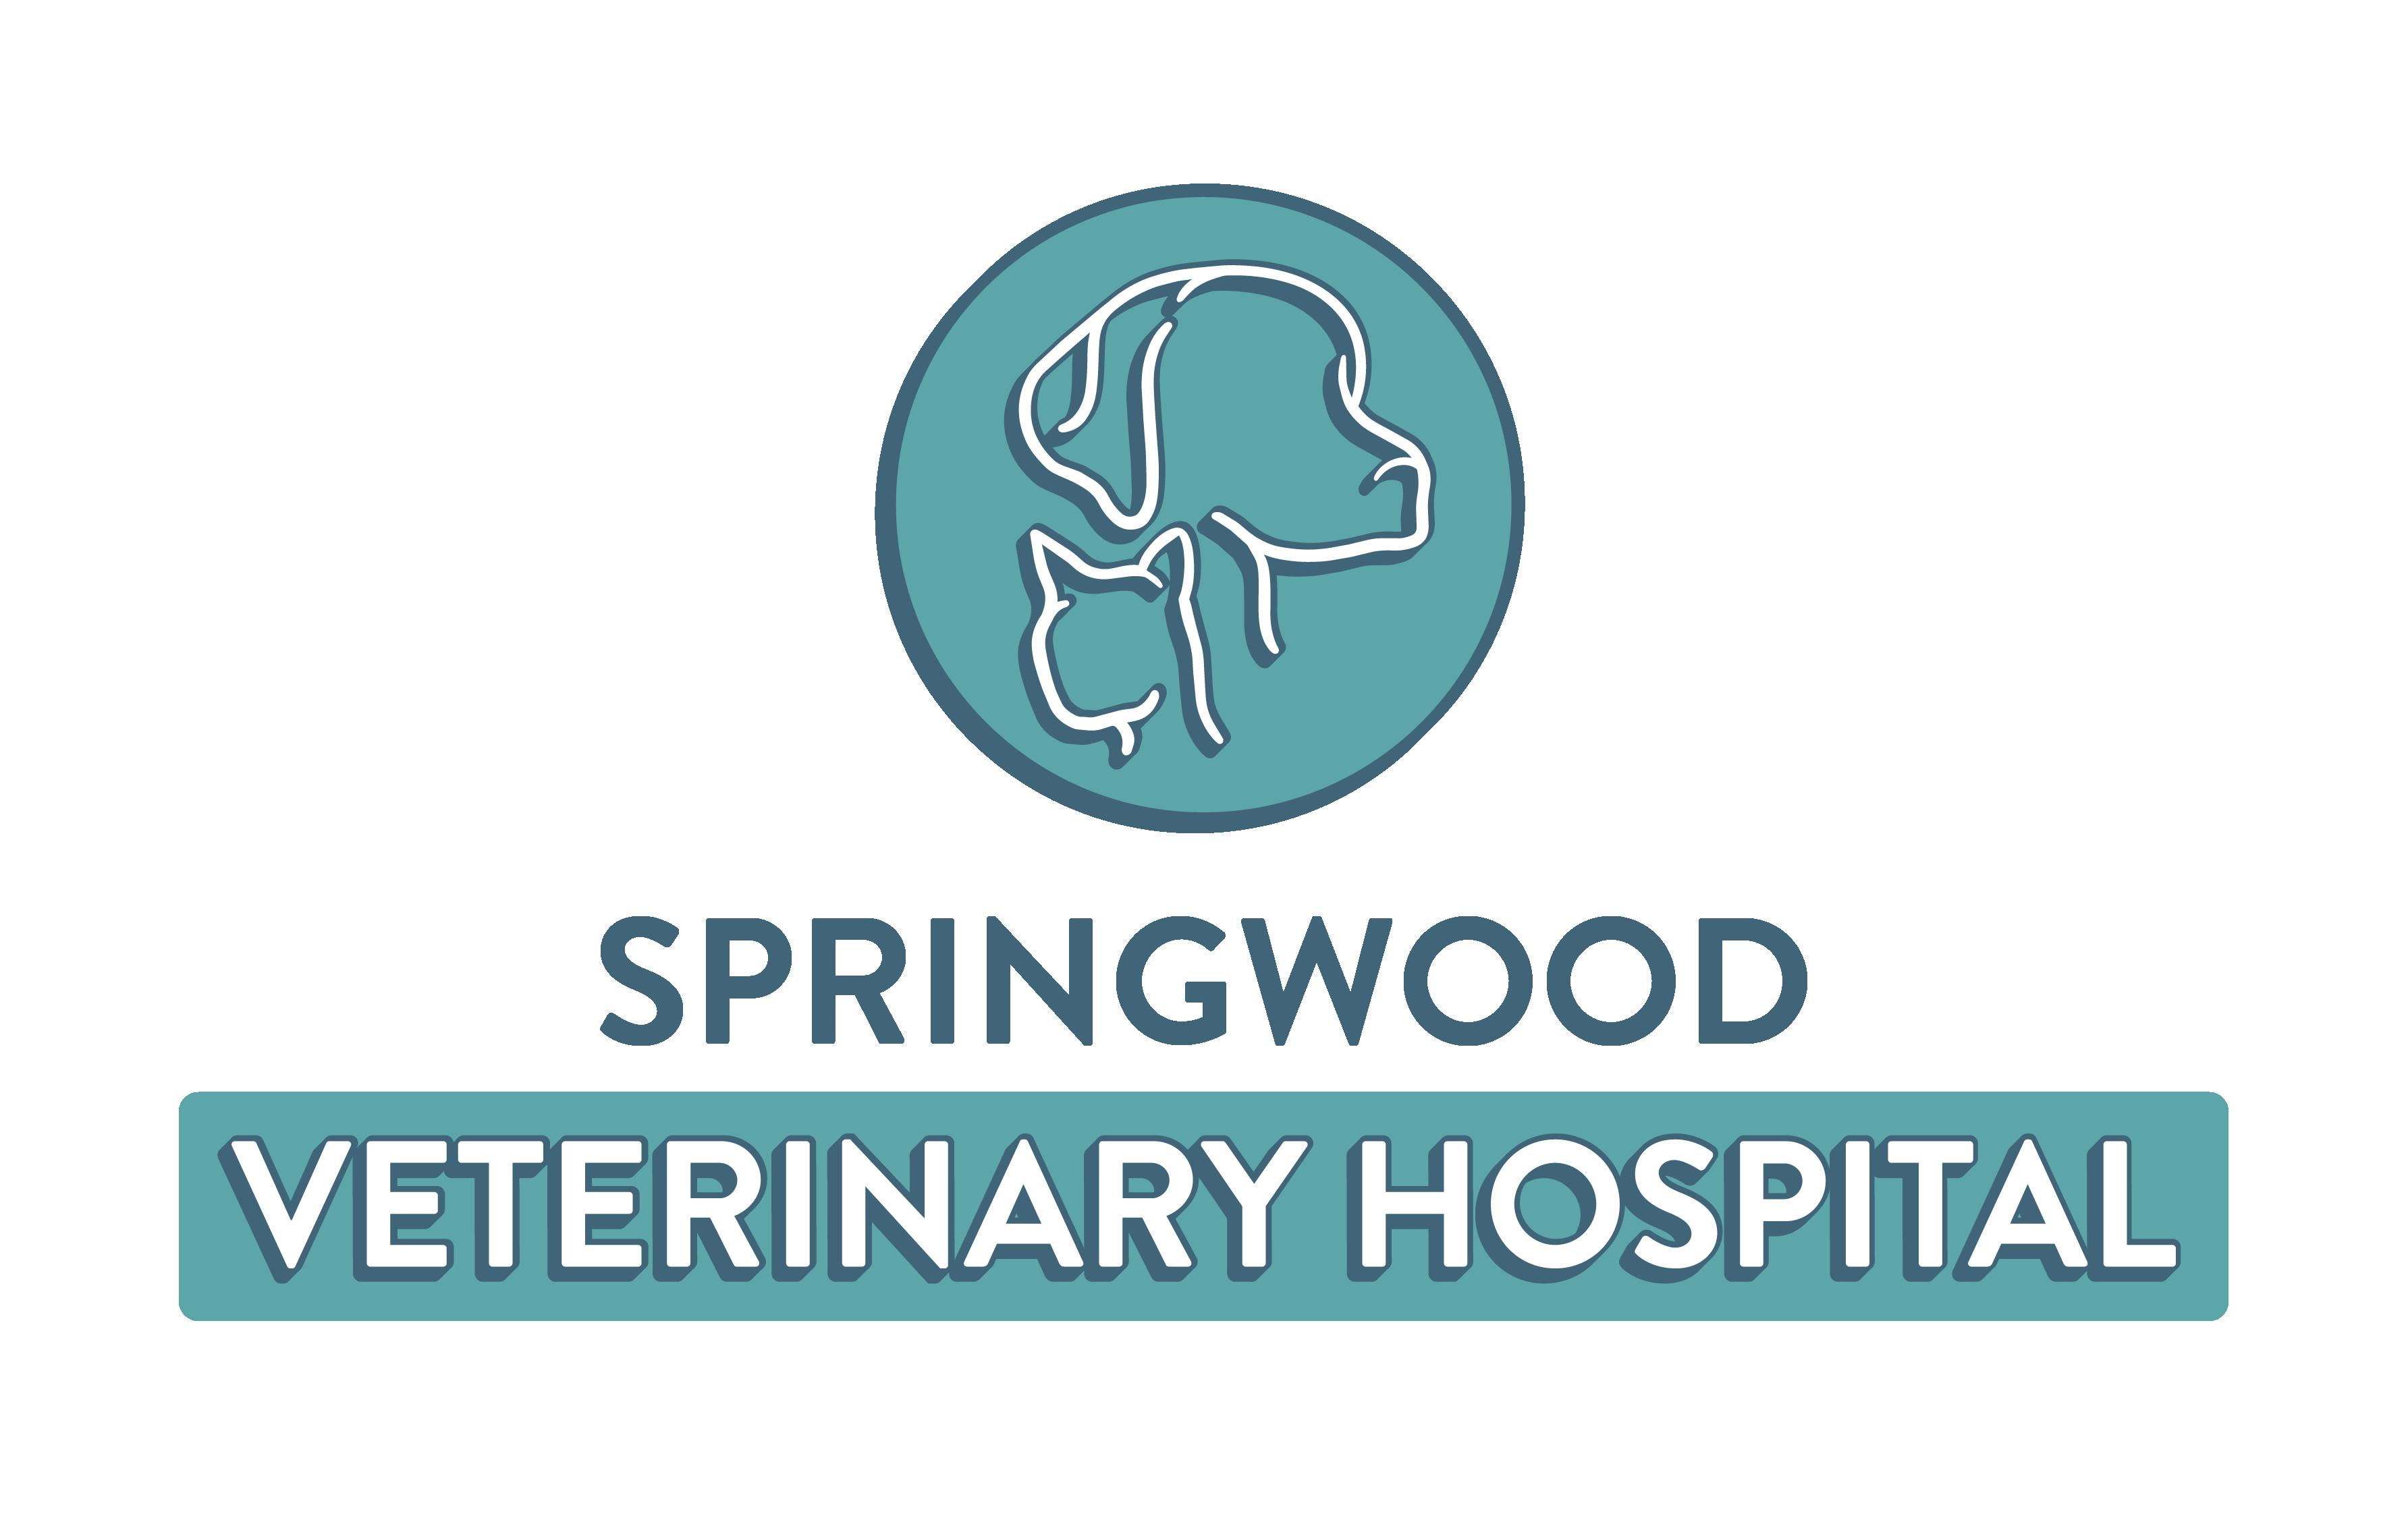 Springwood Veterinary Hospital